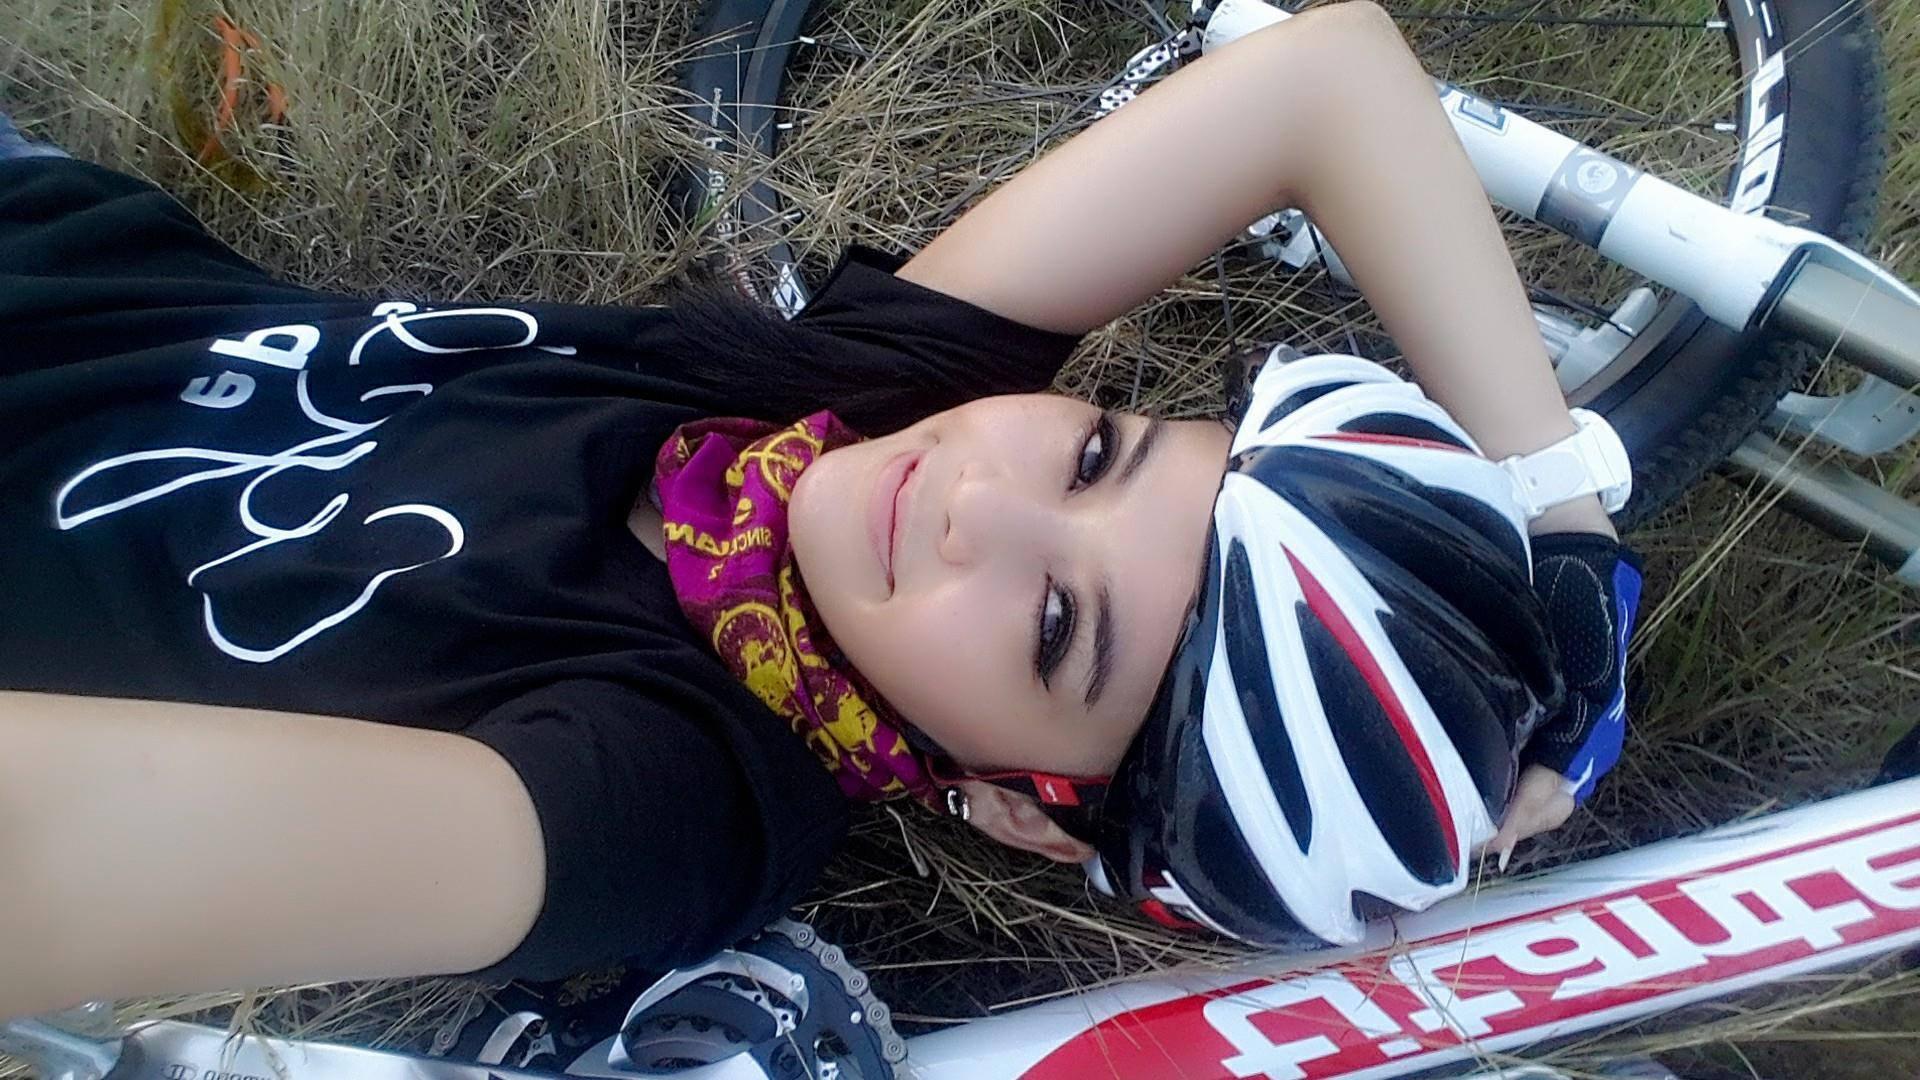 aorry_cooper_lee_selfie_bikegirls.jpg